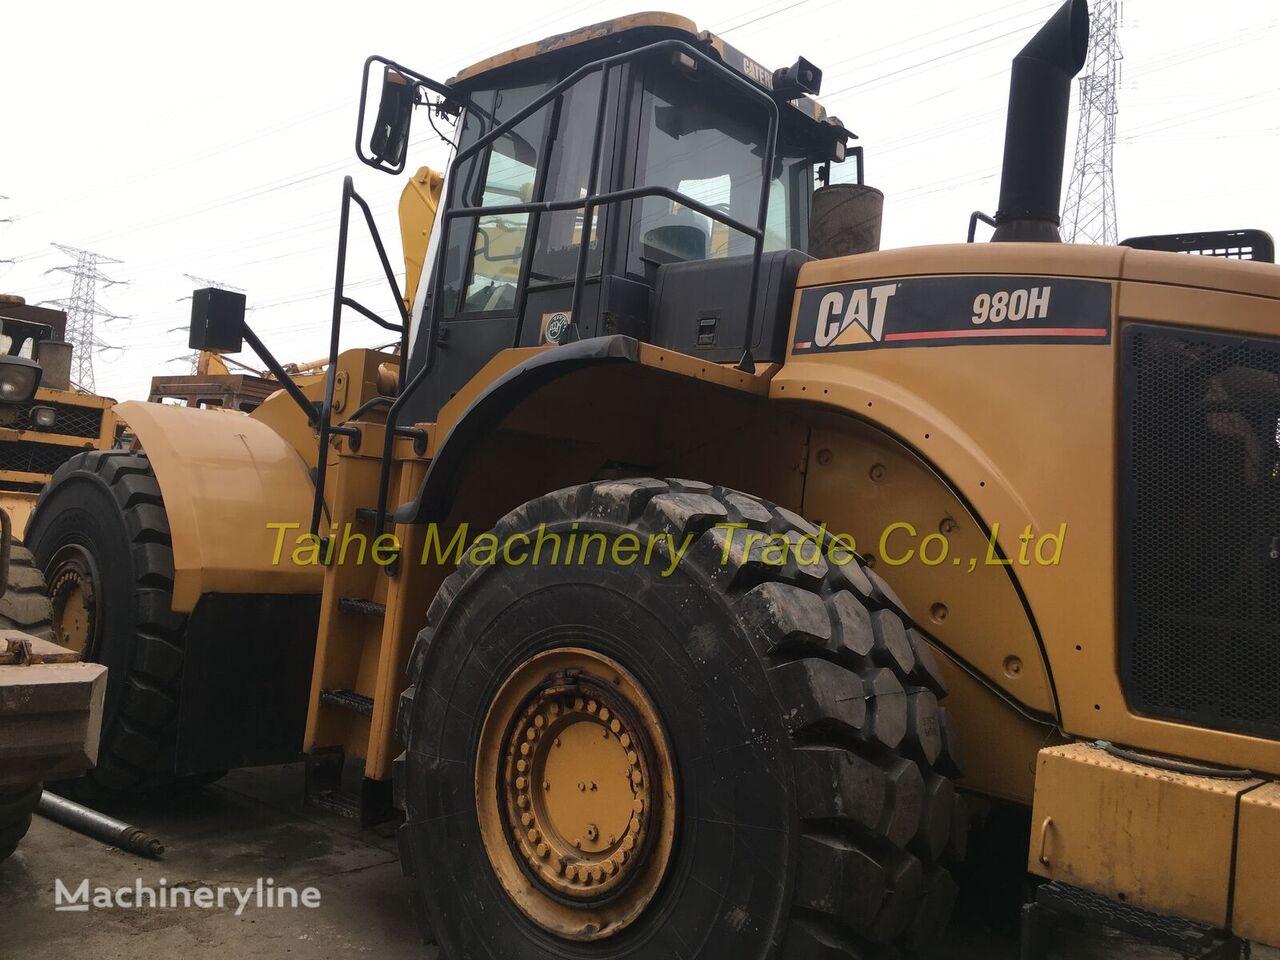 CATERPILLAR 980H wheel loader